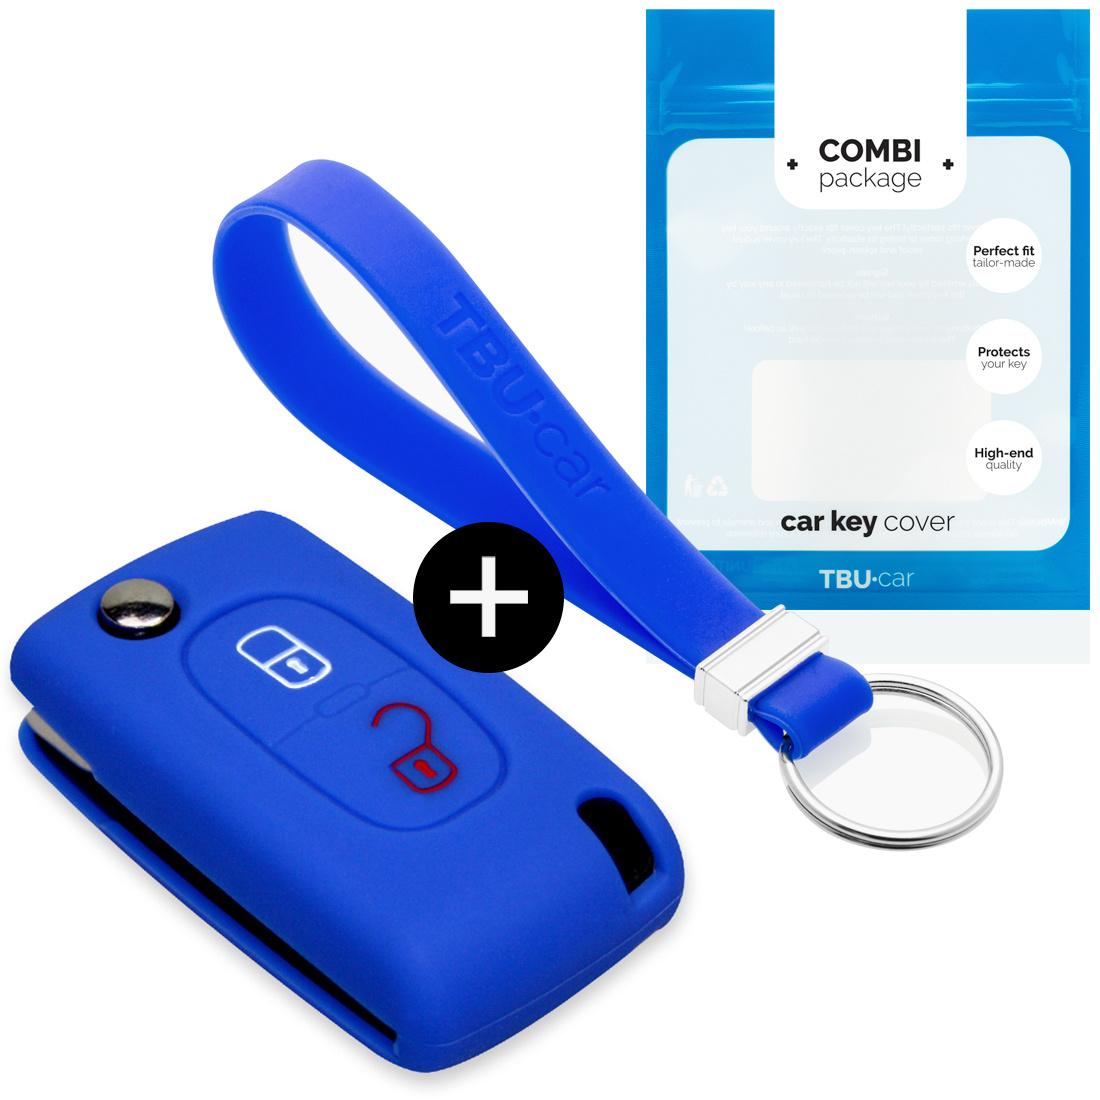 Citroën Car key cover - Azul